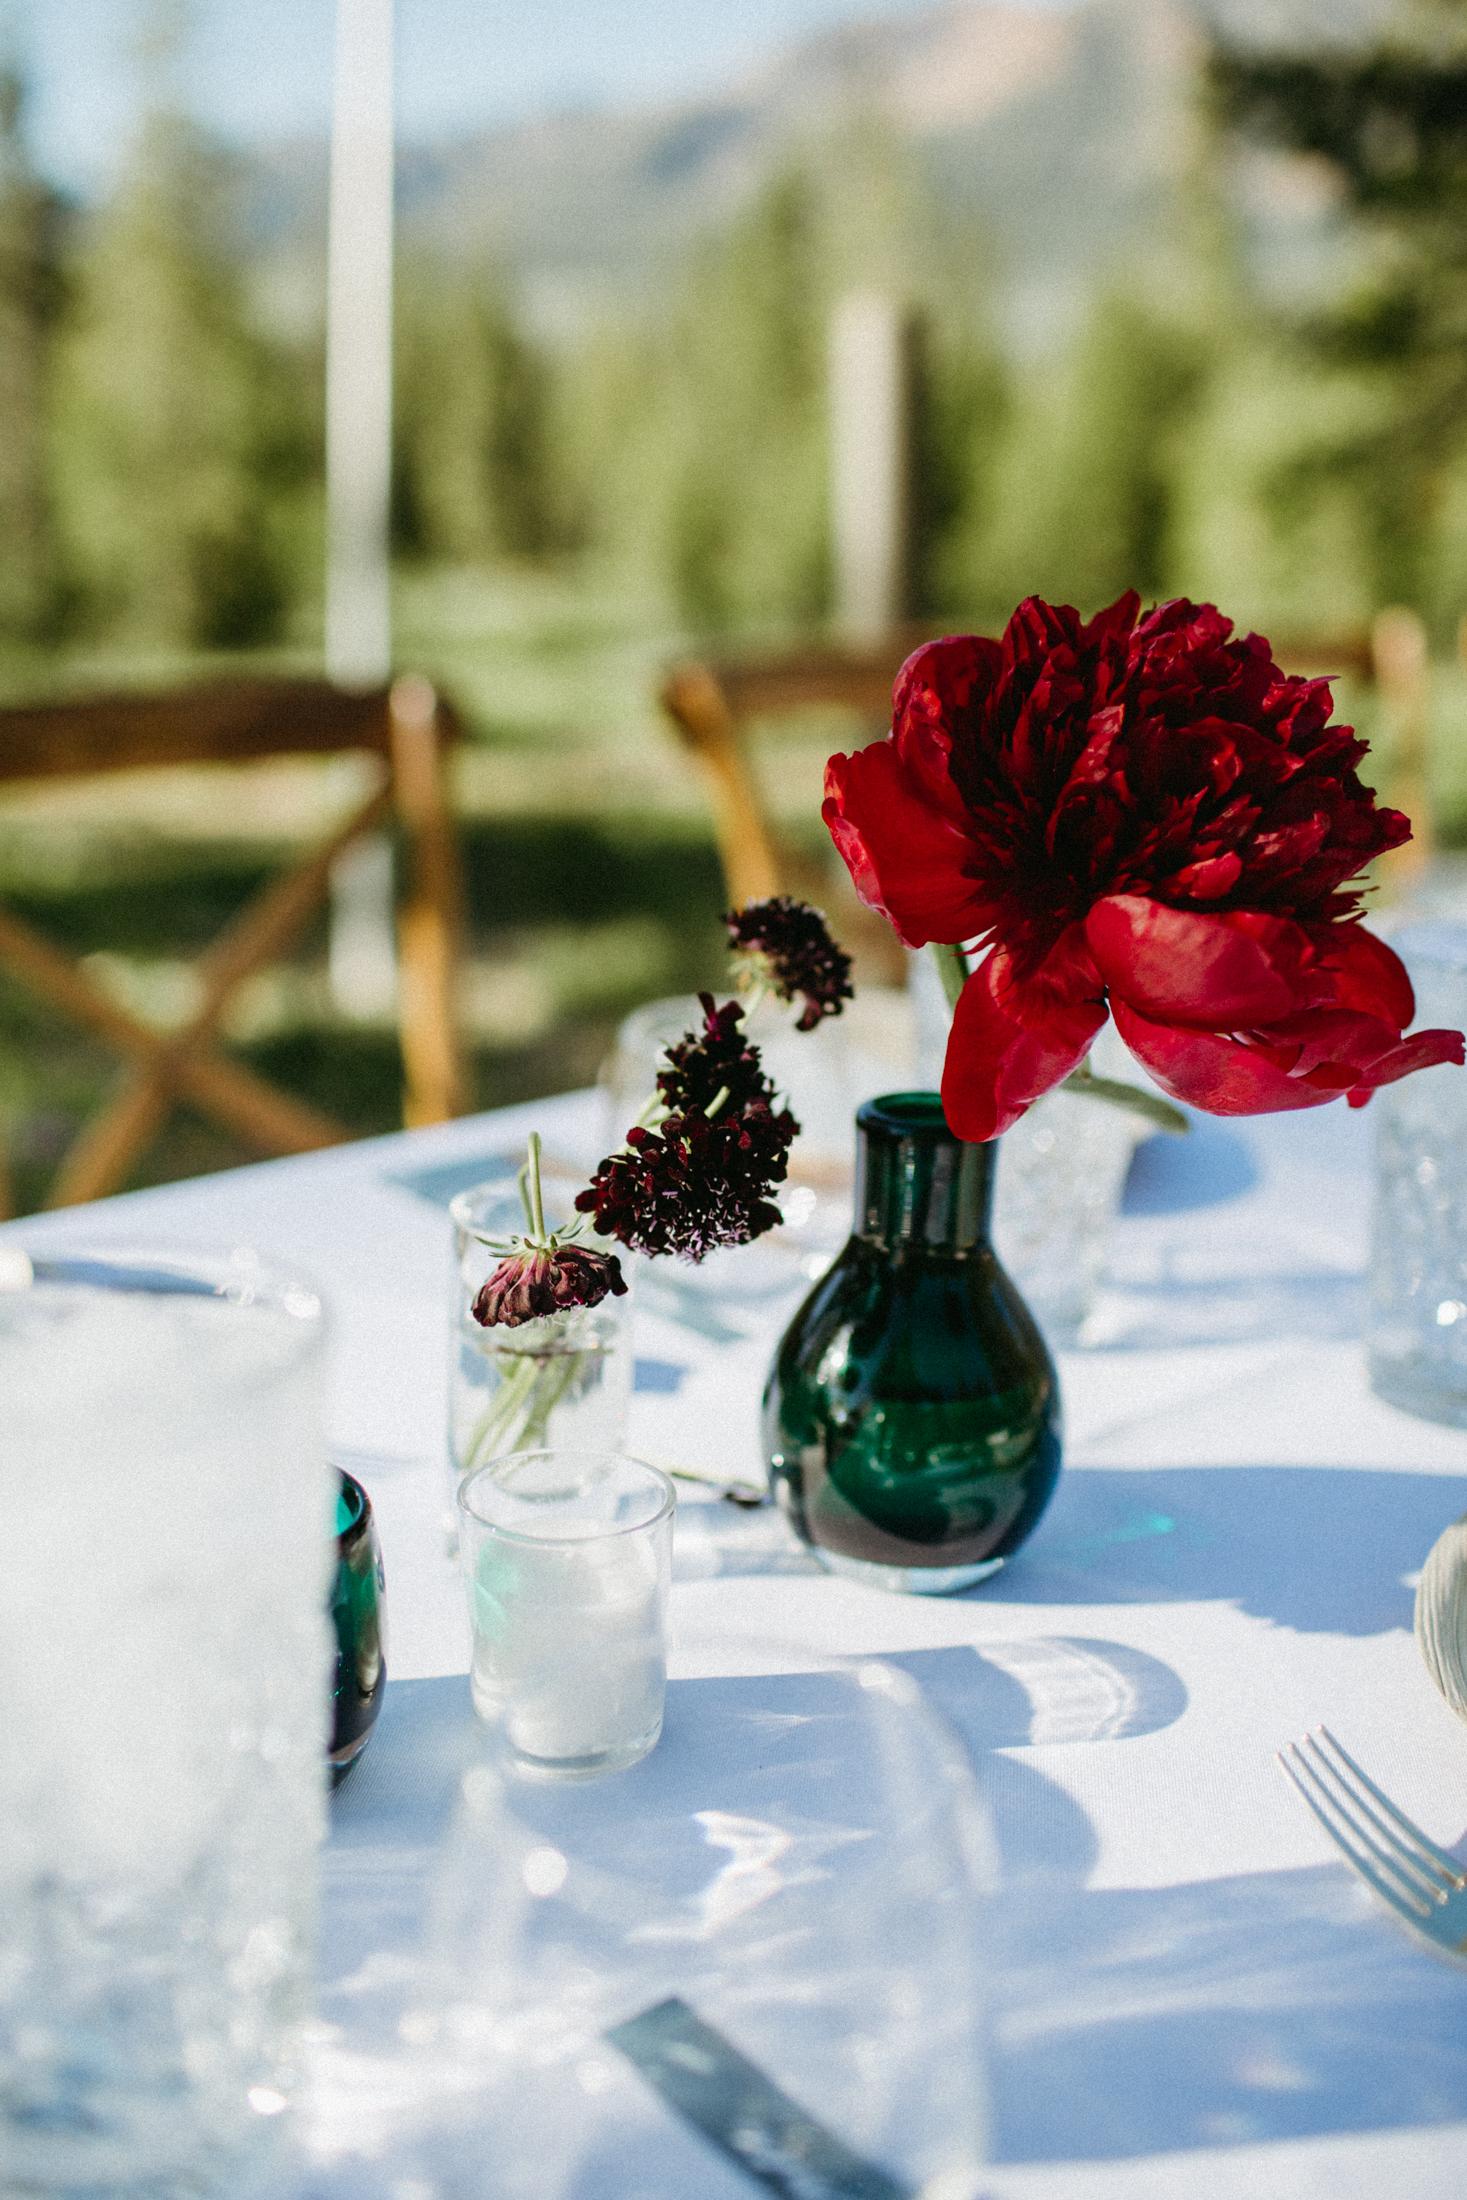 idaho-4h-camp-wedding-christinemarie-106.jpg